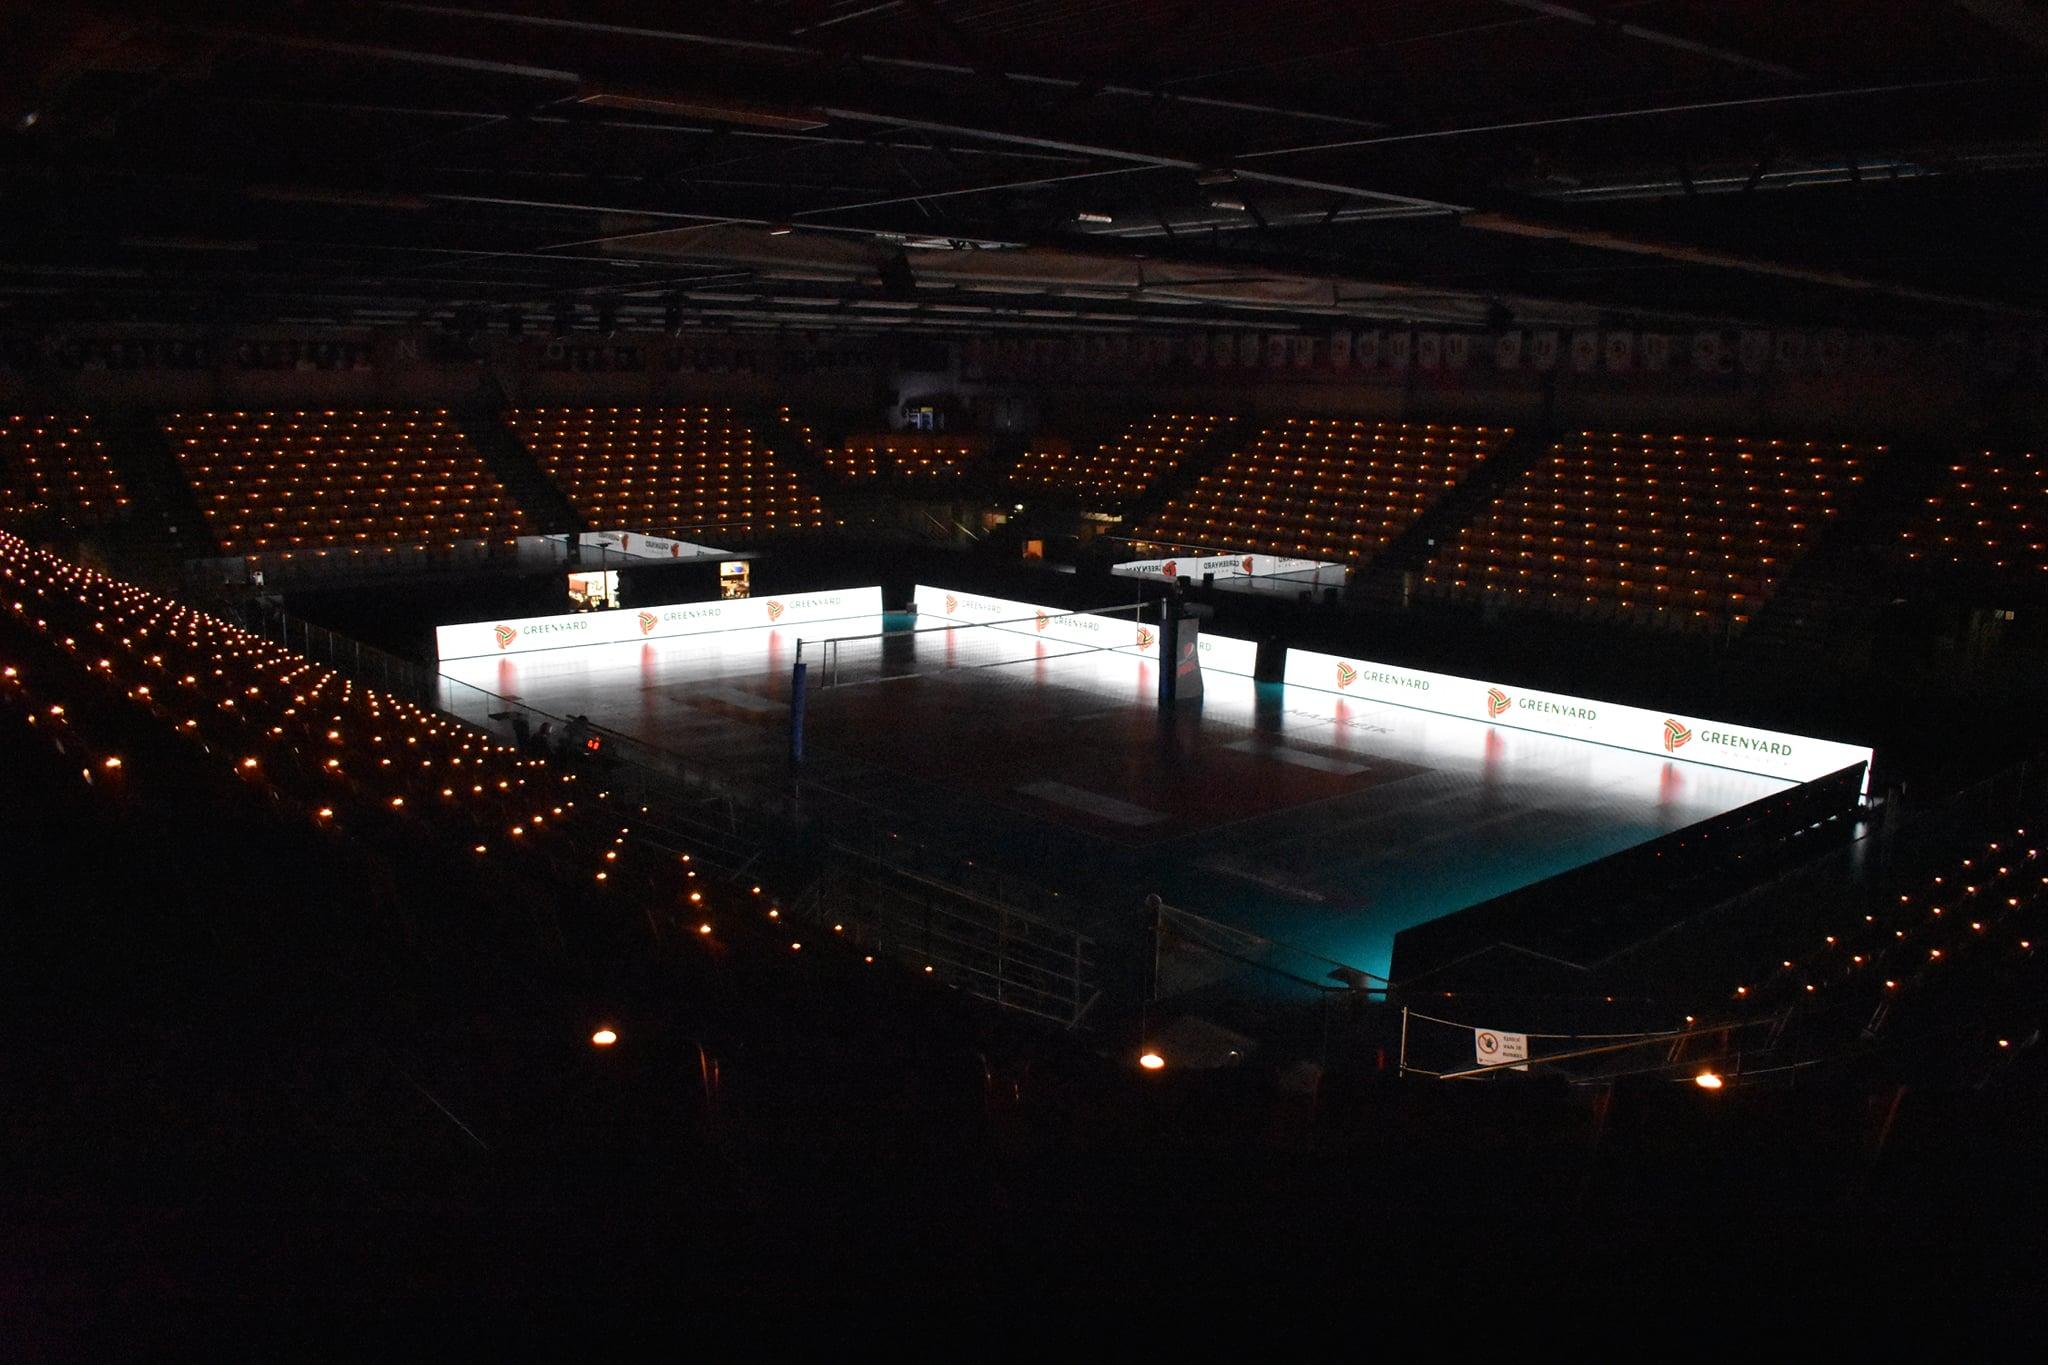 VC GREENYARD Maaseik brengt licht in deze duistere tijden